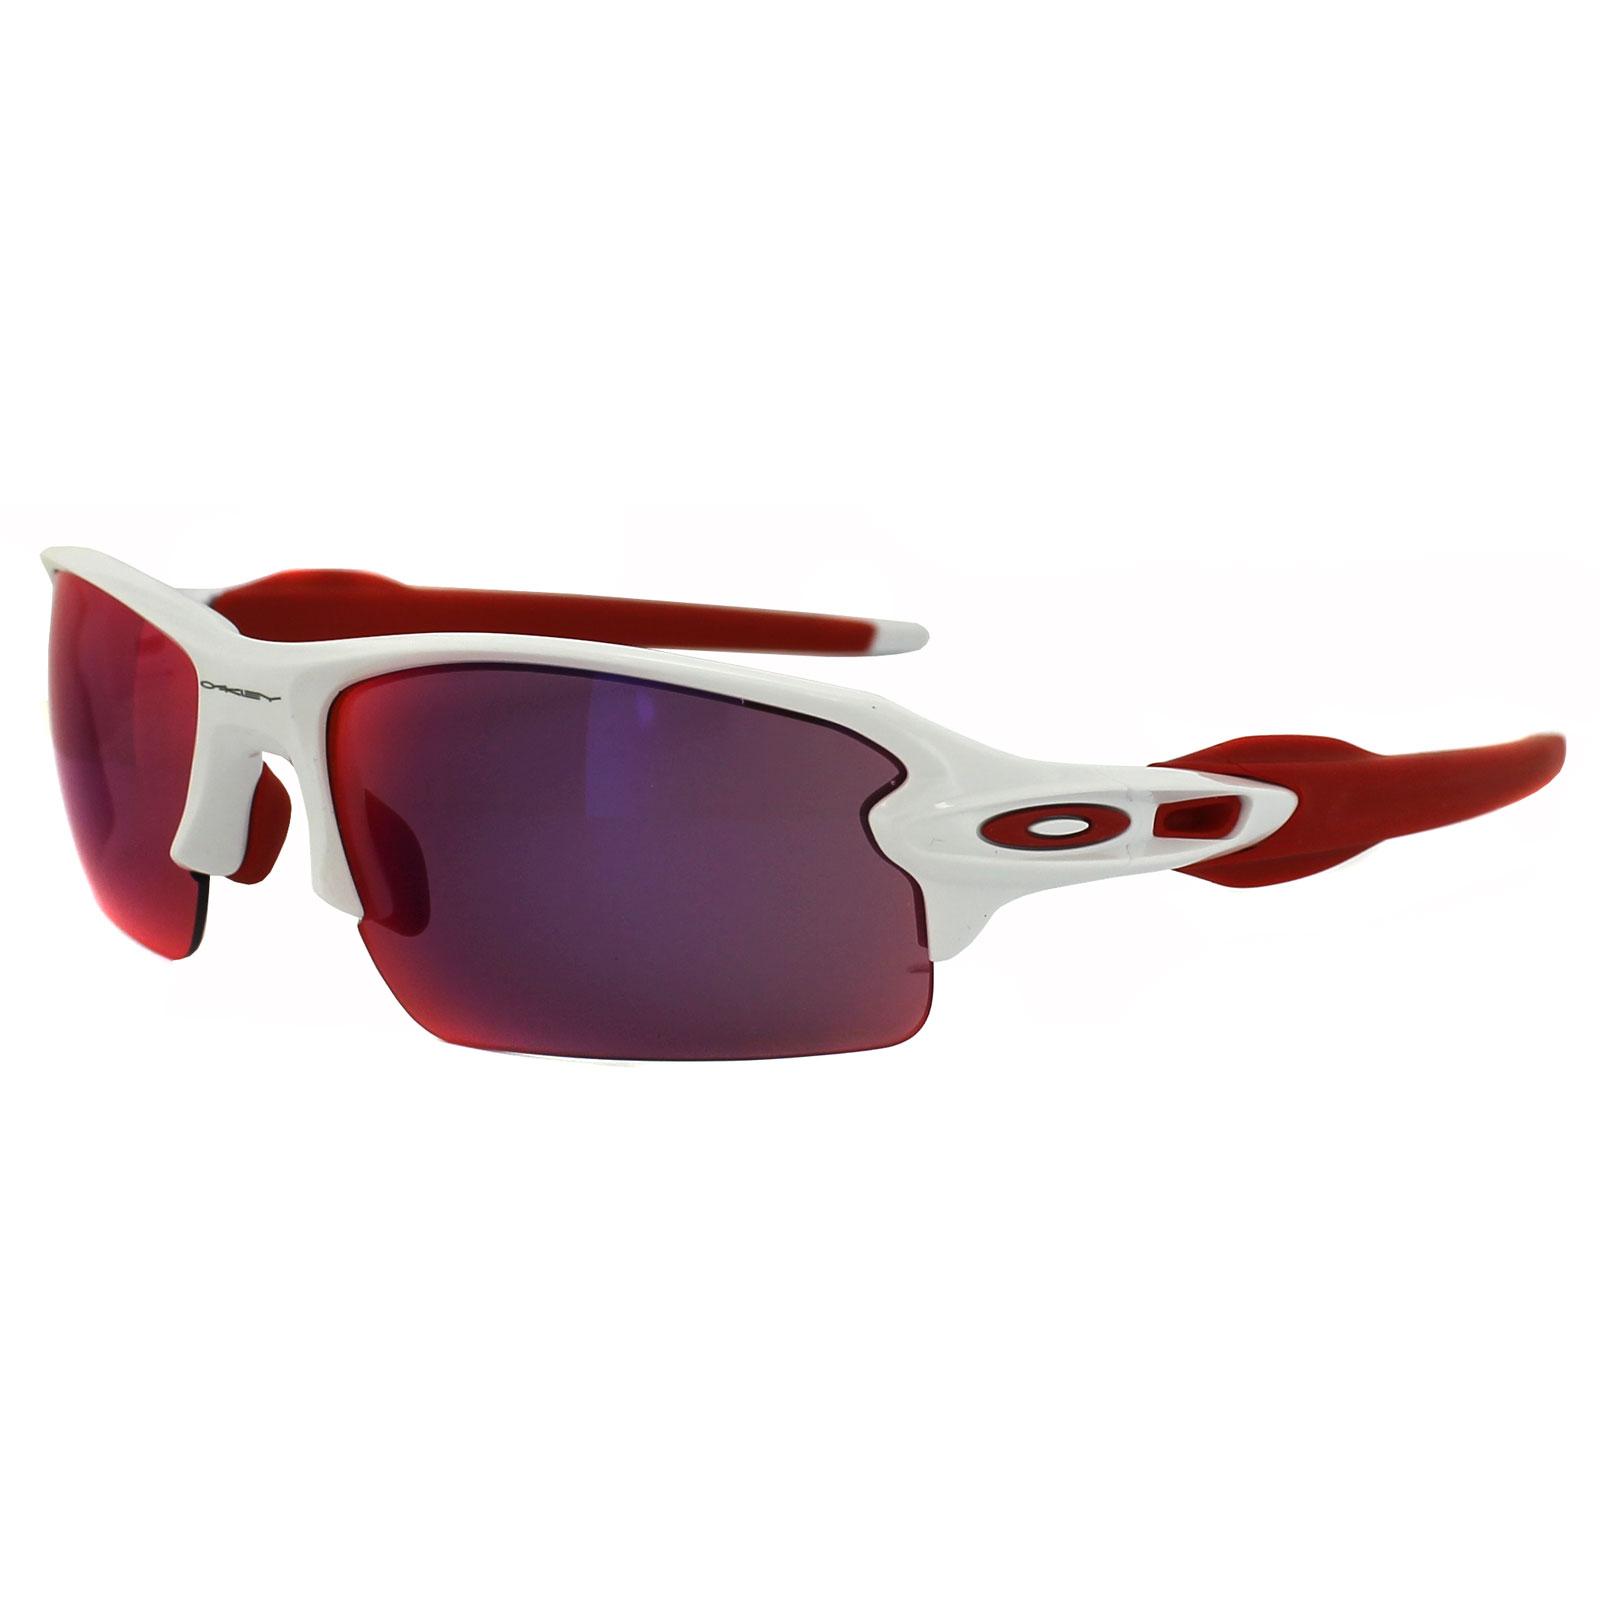 4934872711 Cheap Oakley Flak 2.0 Sunglasses - Discounted Sunglasses